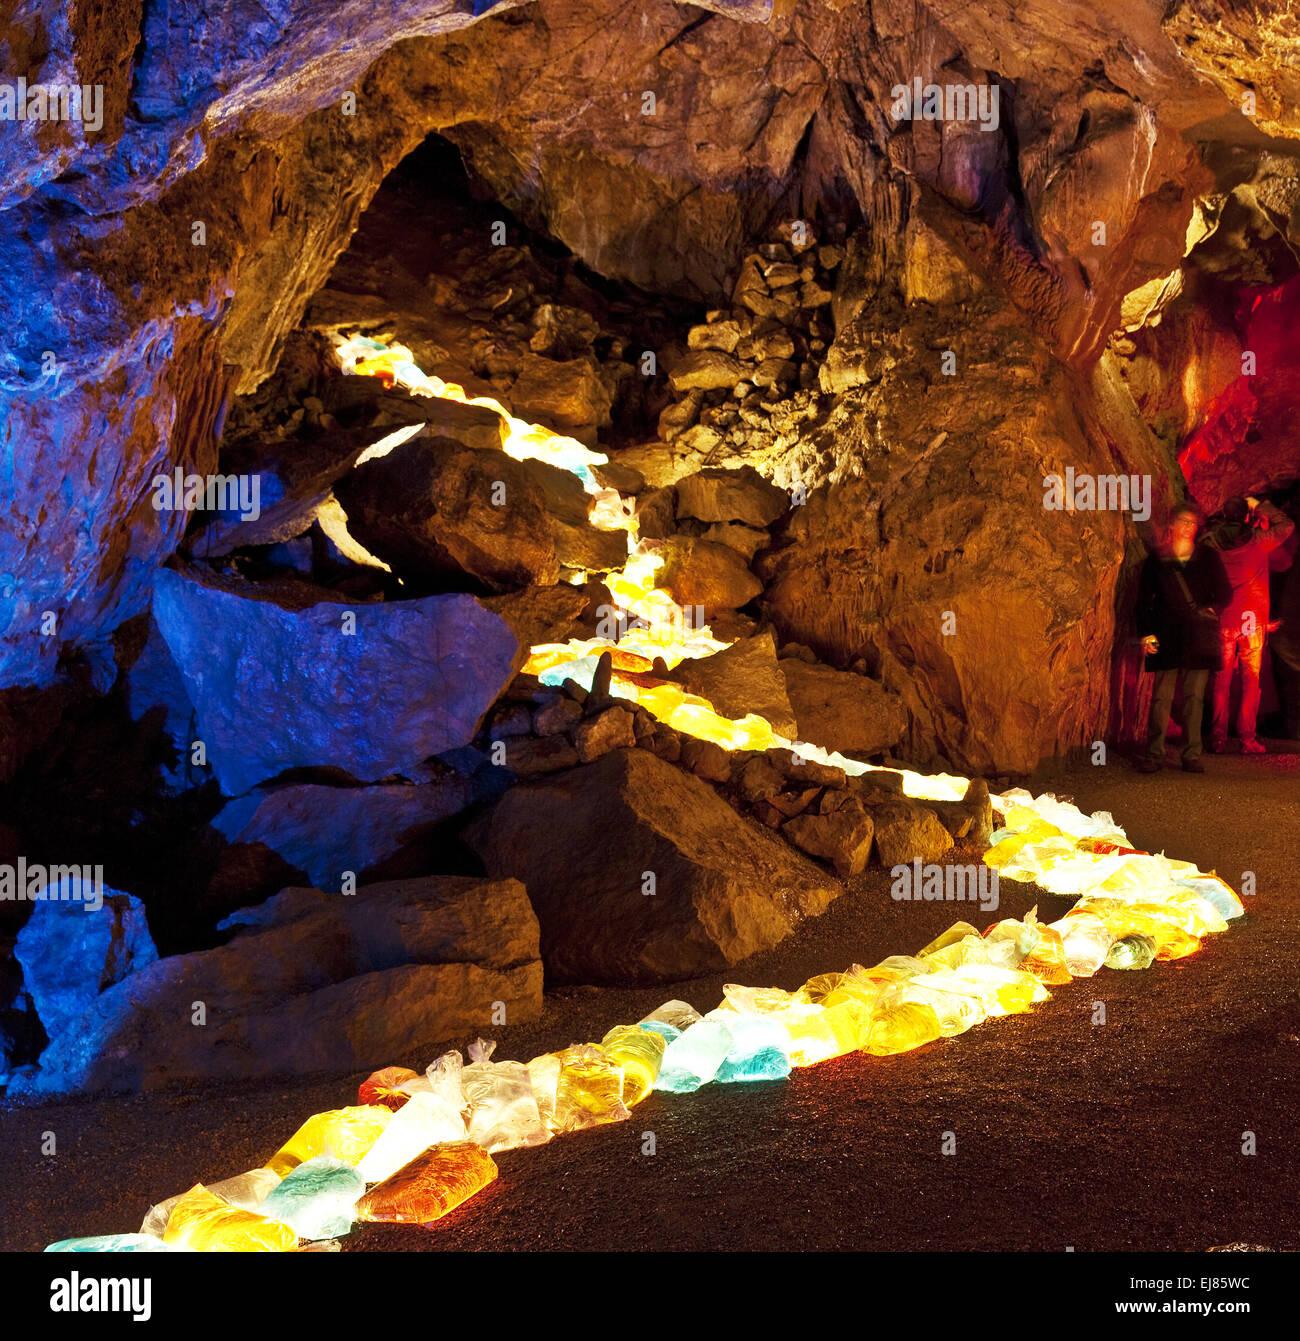 Cave lights, Dechen Cave, Iserlohn, Germany - Stock Image